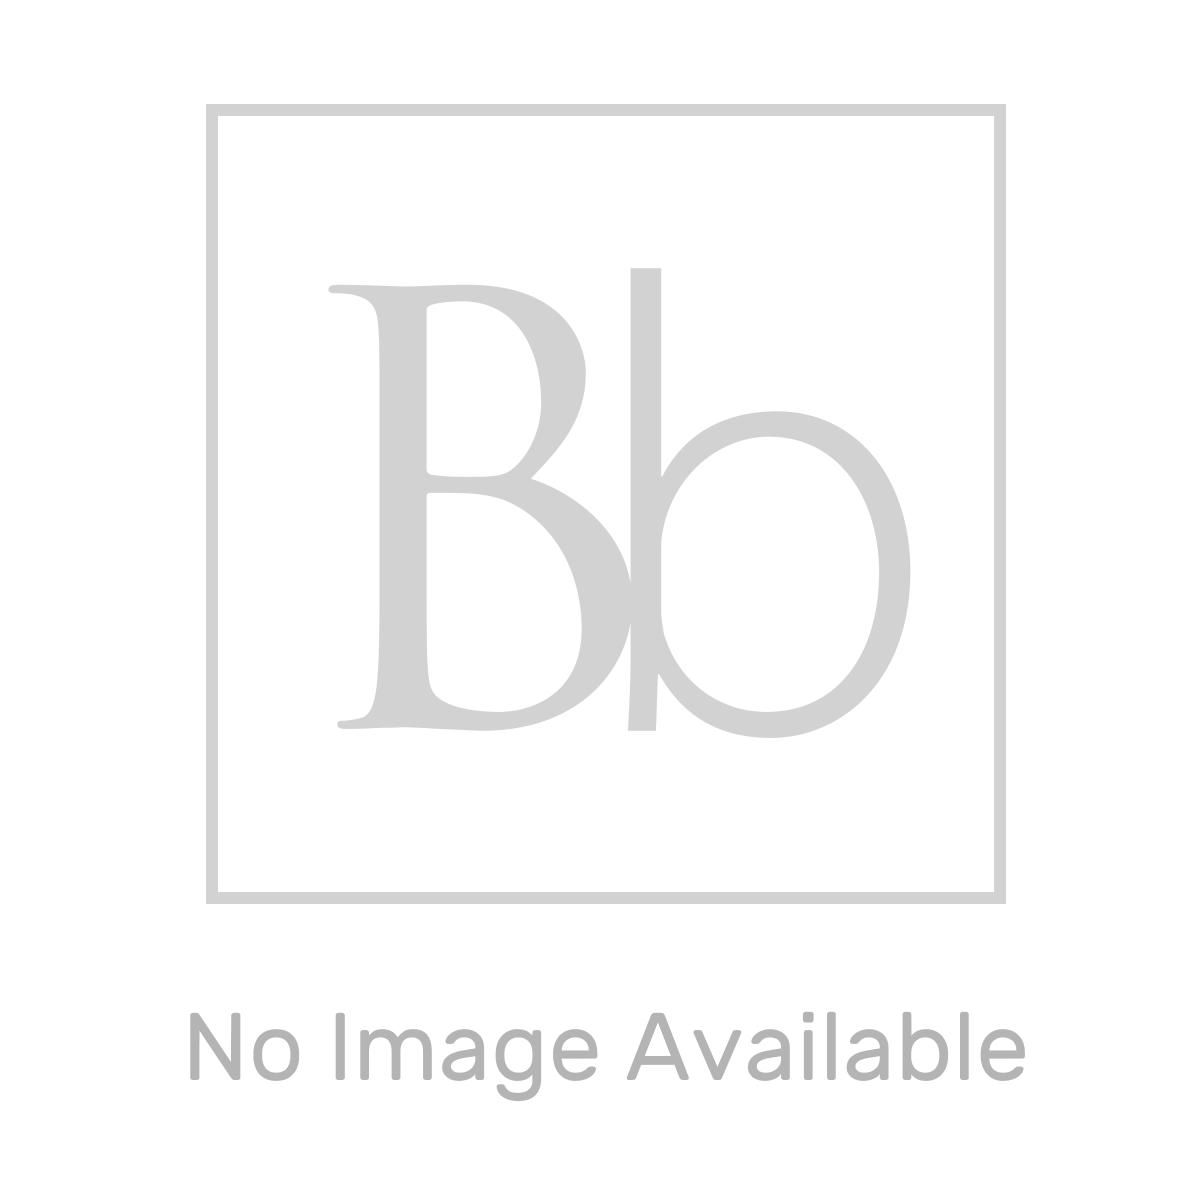 Ikoma White Gloss Vanity Unit with Basin 850mm Lifestyle